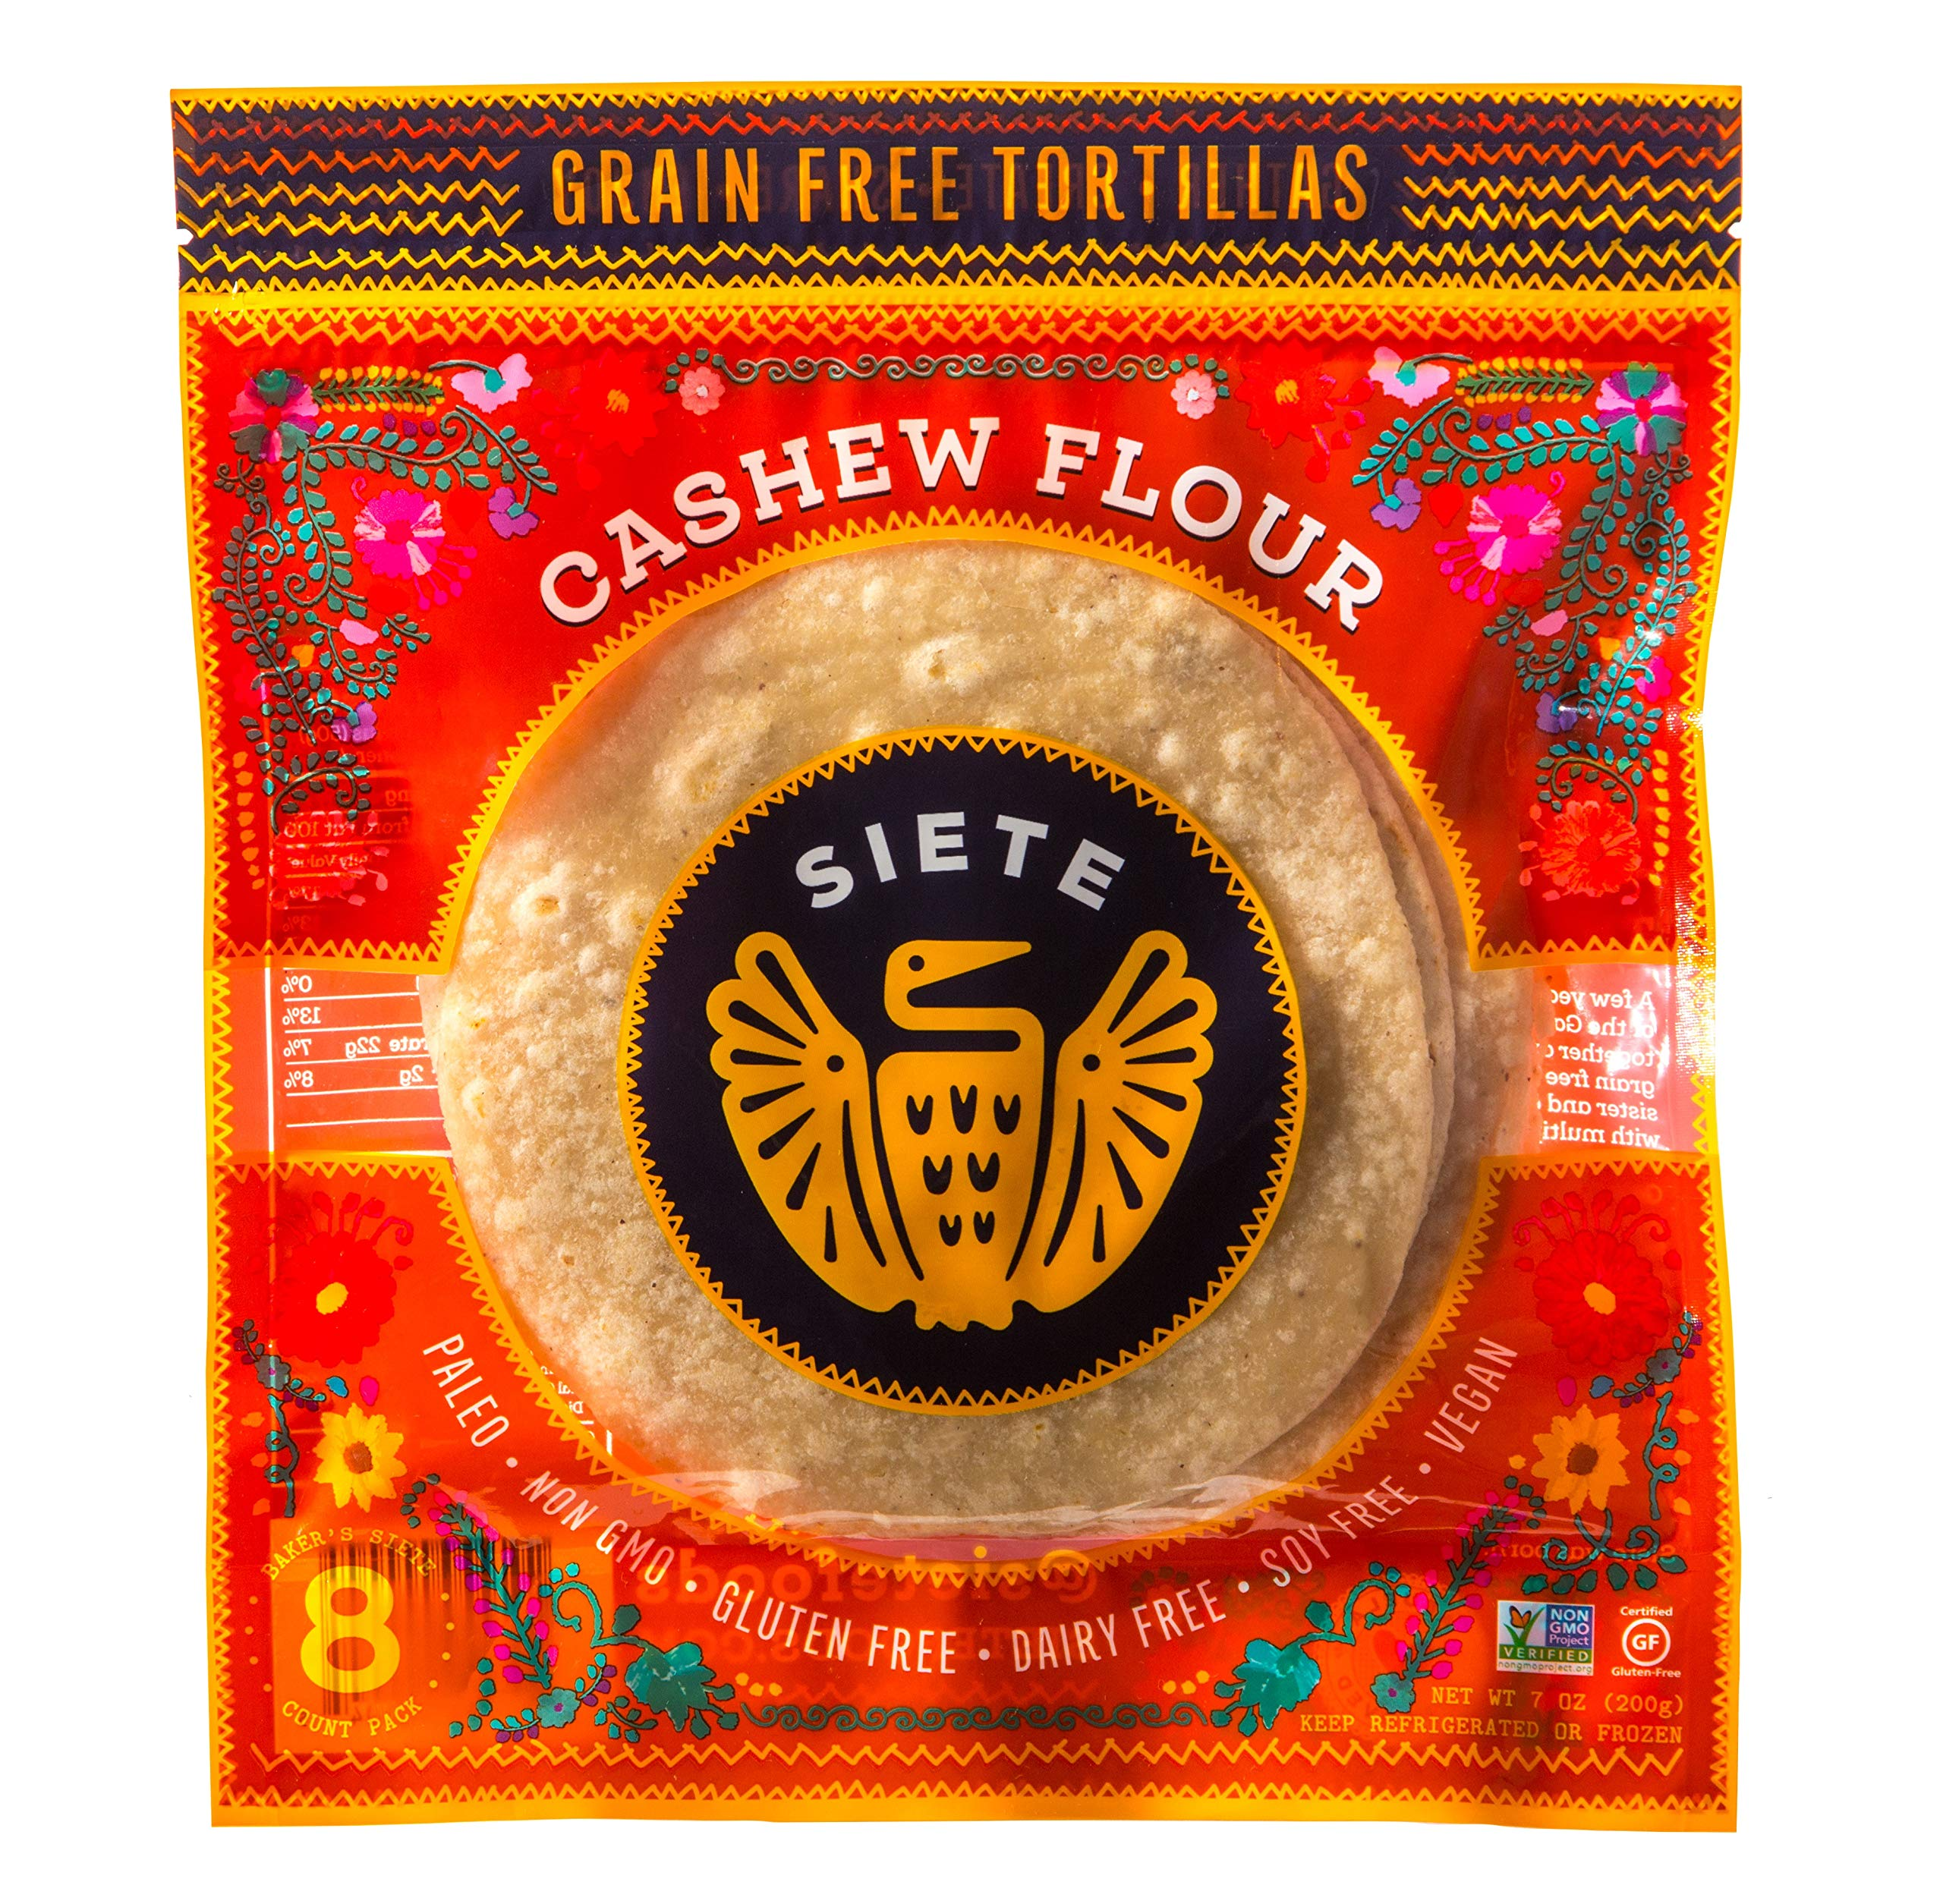 Siete Cashew Flour Grain Free Tortillas, 8 Tortillas Per Pack, 6-Pack, 48 Tortillas by Siete